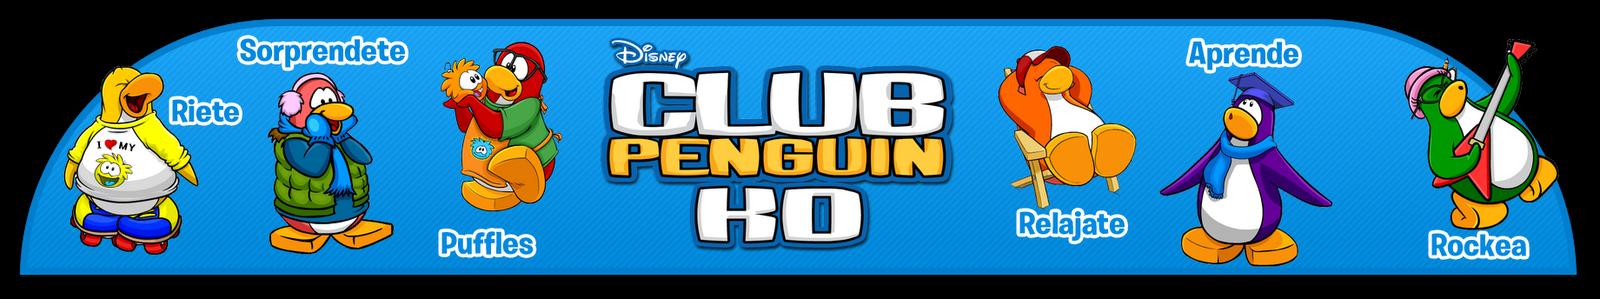 clubpenguinkd™